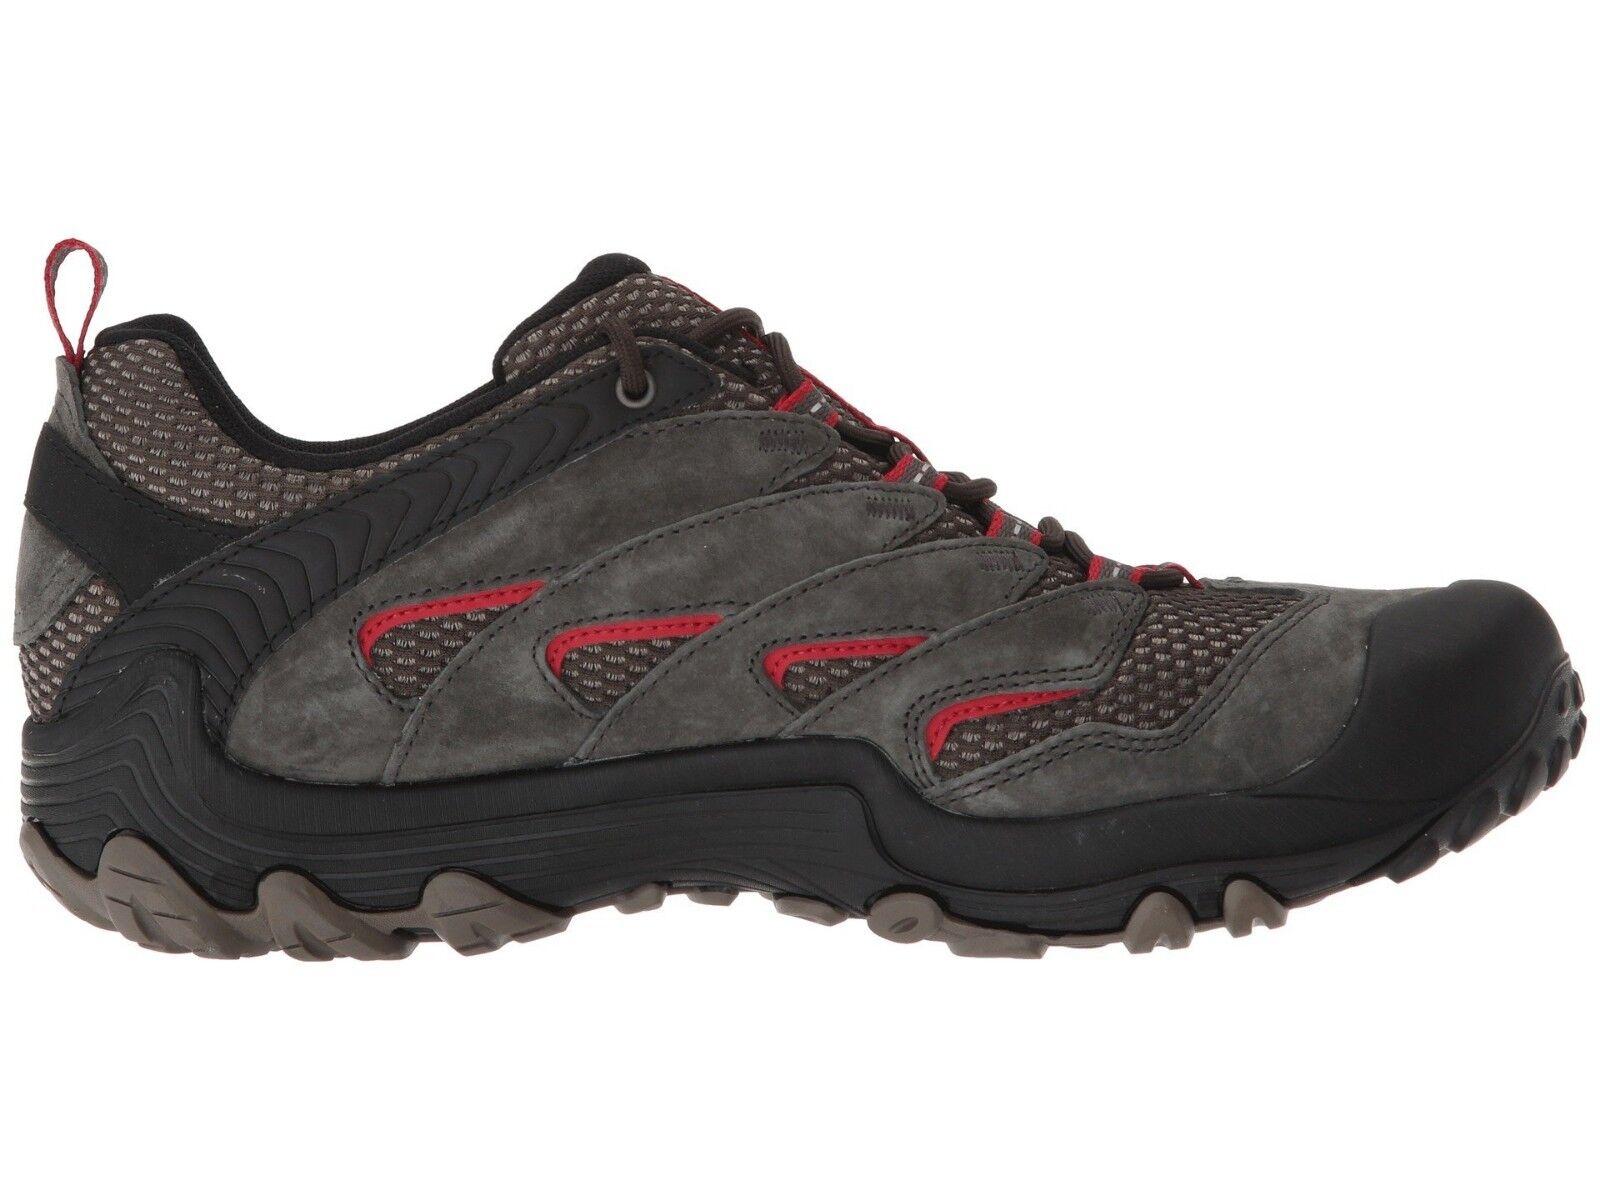 Merrell Men's Chameleon 7 Trail & Hiking Shoe Boot Size US 10 D / NIB